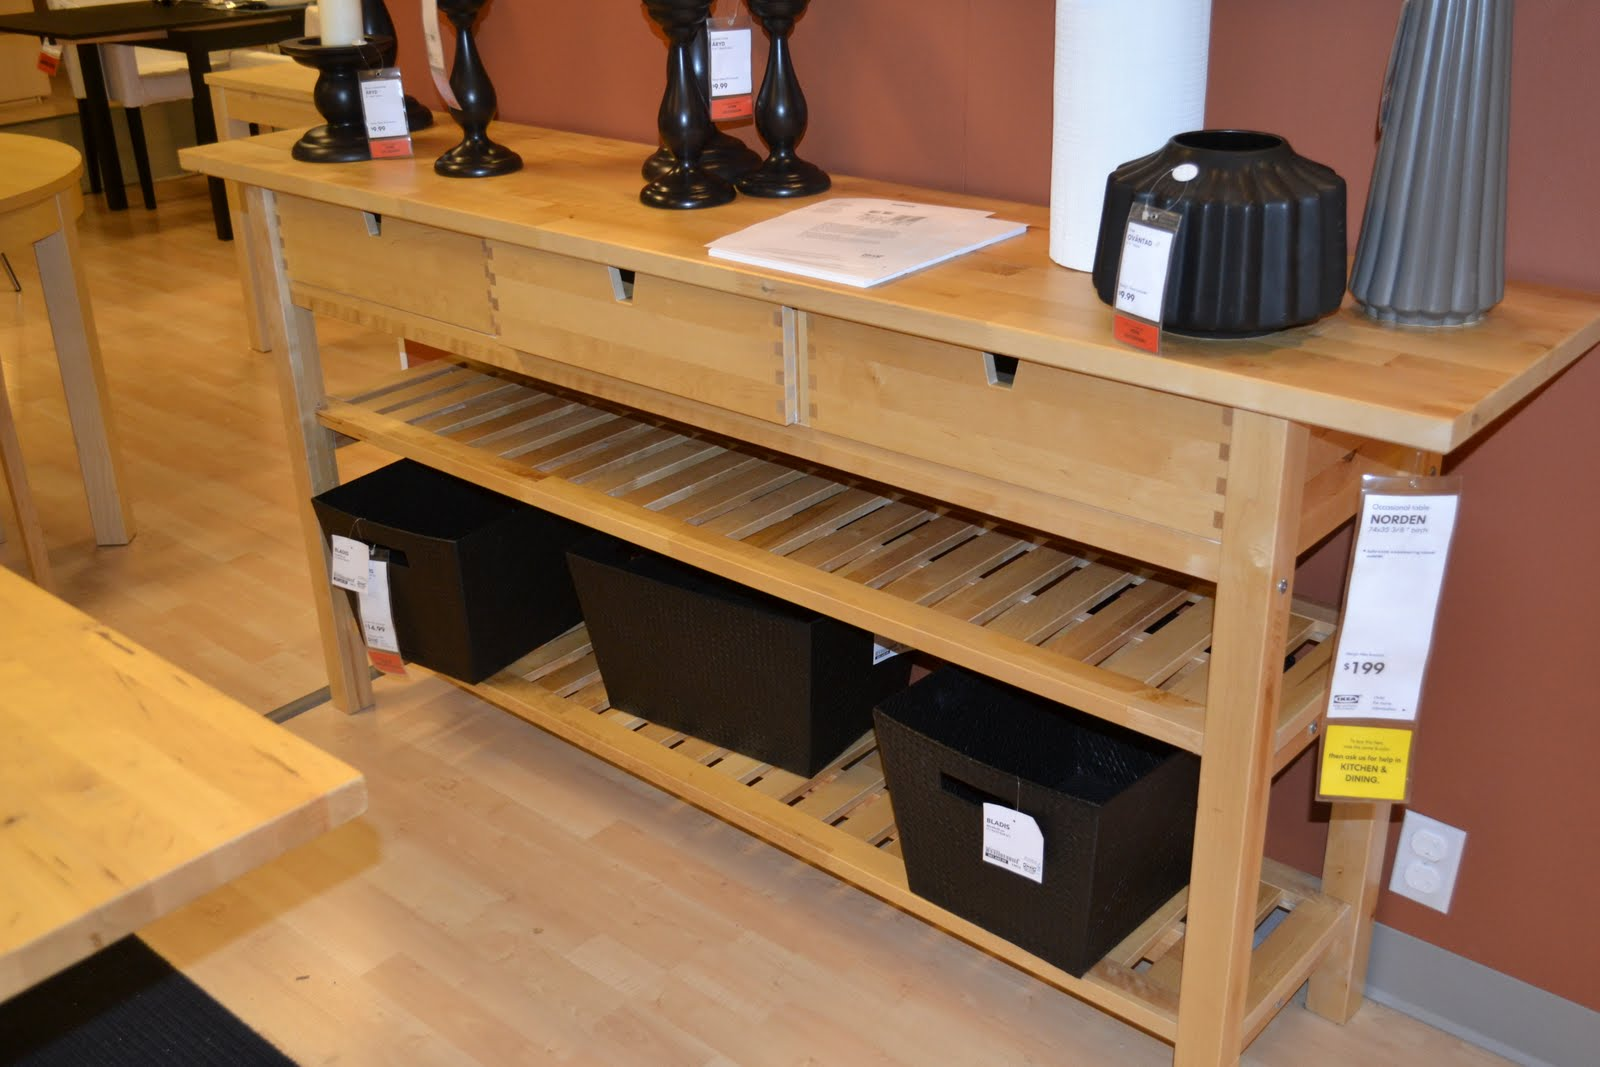 craigslist kitchen island mobile home sinks ikea stenstorp table  nazarm